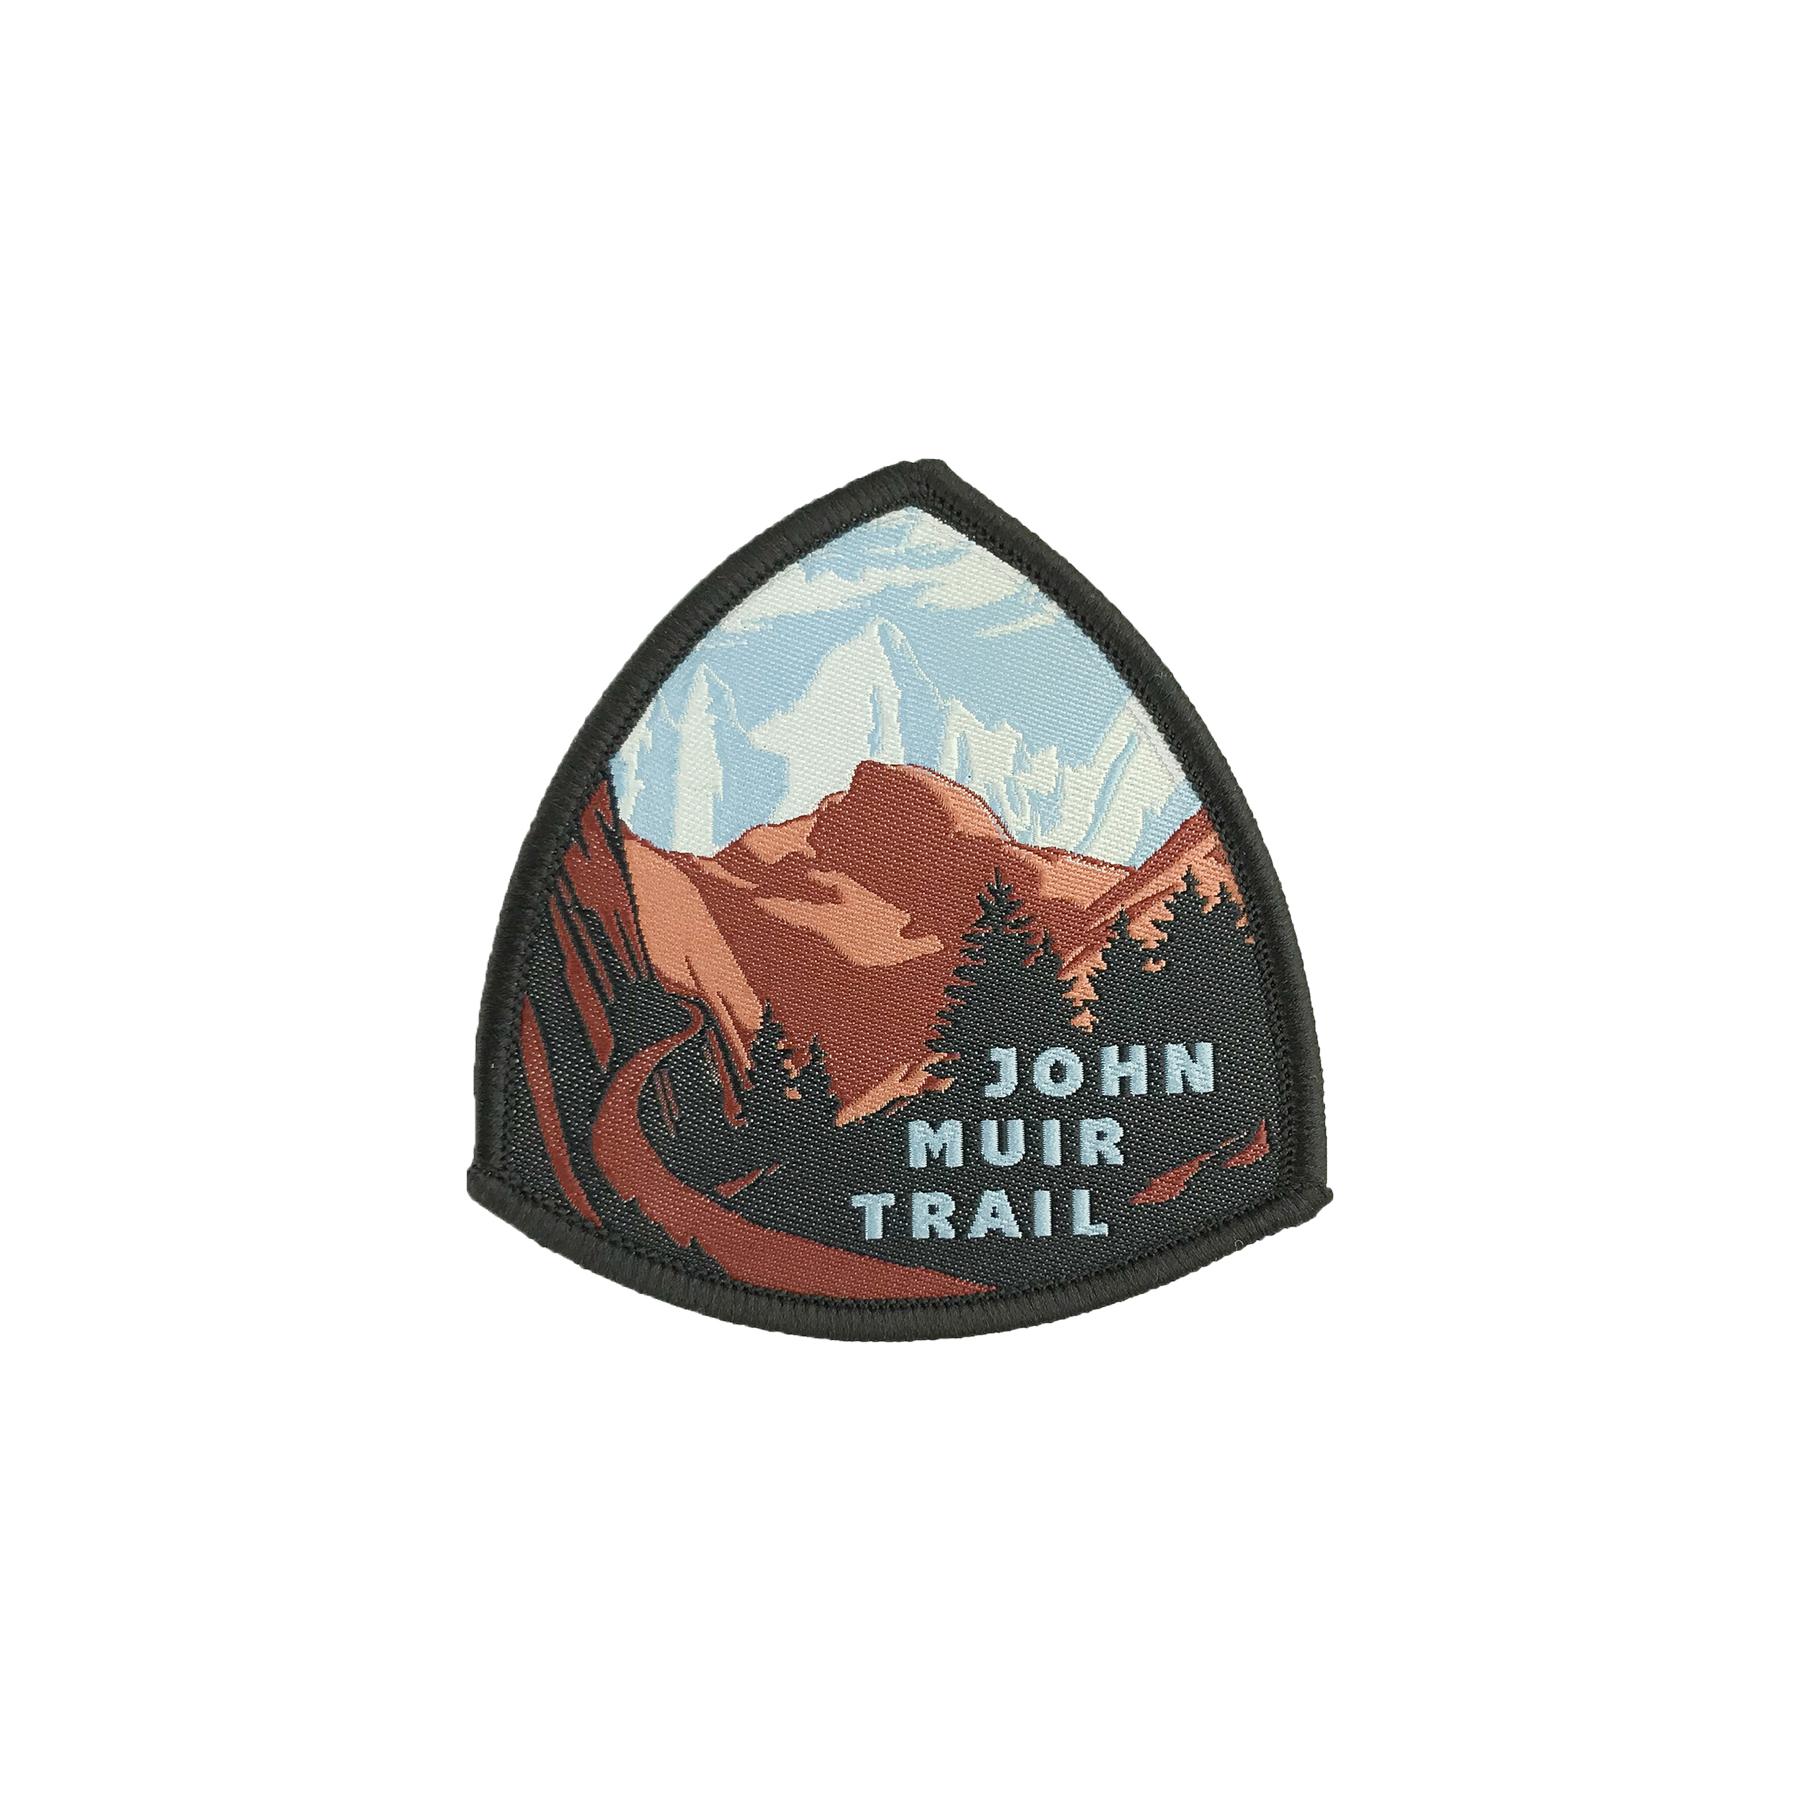 john-muir-trail-patch.jpg